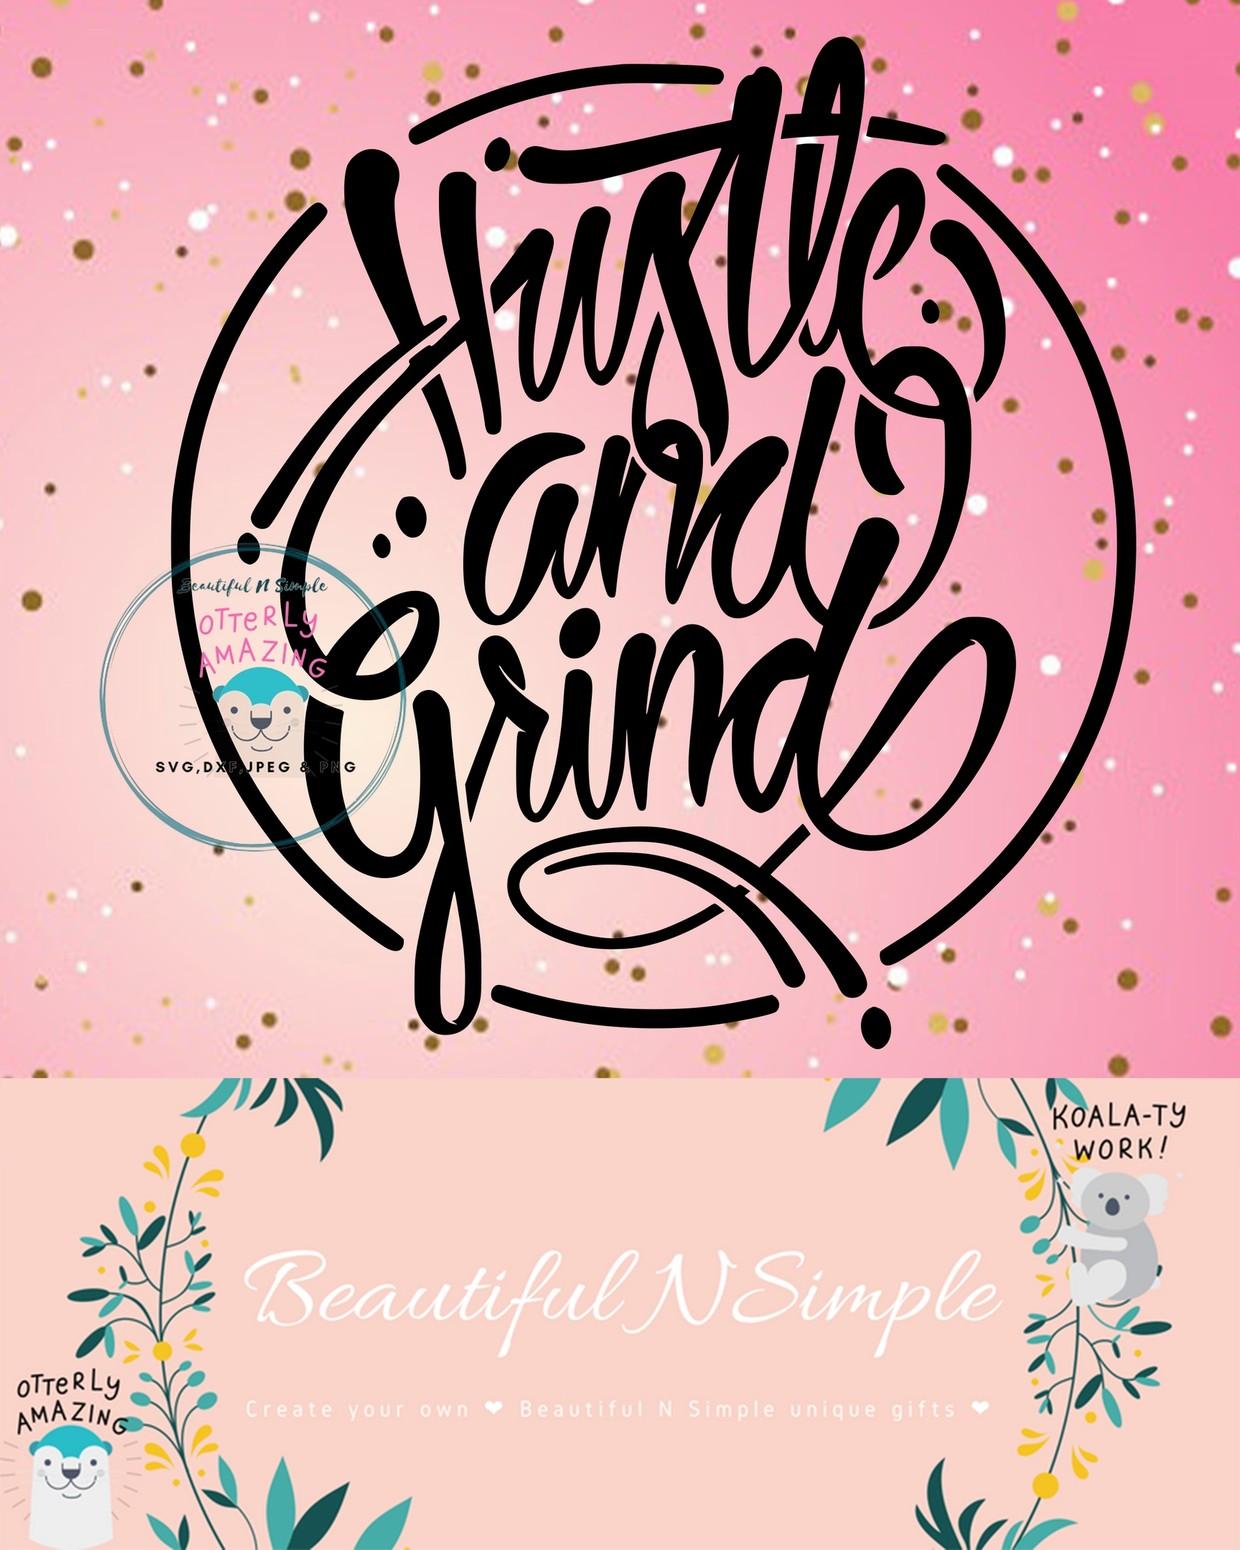 Hustle And Grind Svg Dxf File Beautifulnsimple